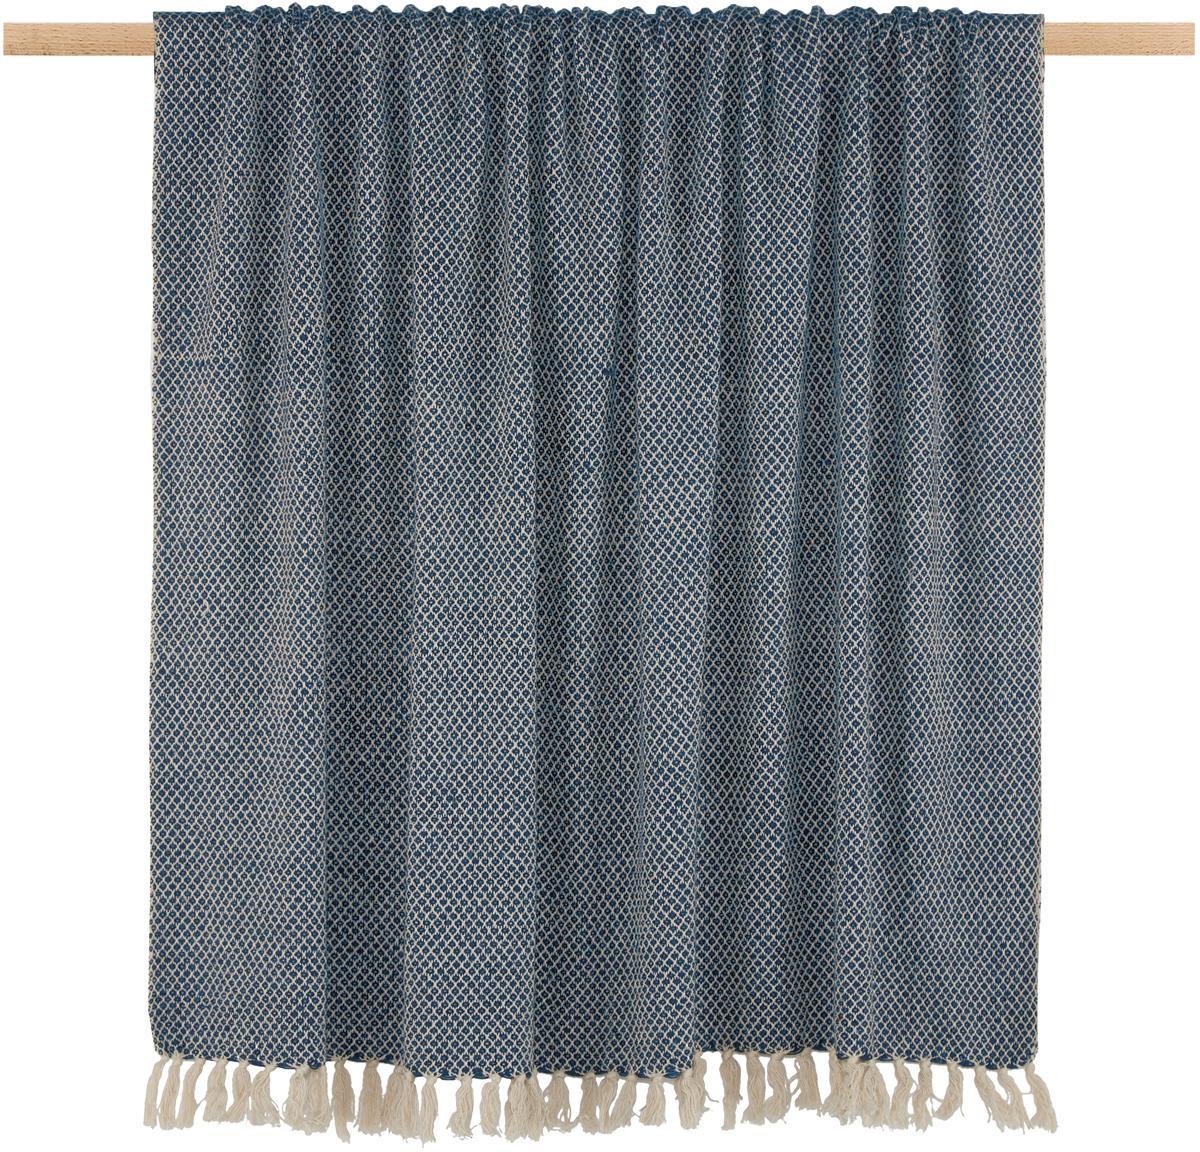 Manta Thea, 58%algodón,22%poliéster, 12%acrílico,4%Rayon,4%nylon, Azul marino, beige claro, An 130 x L 160 cm